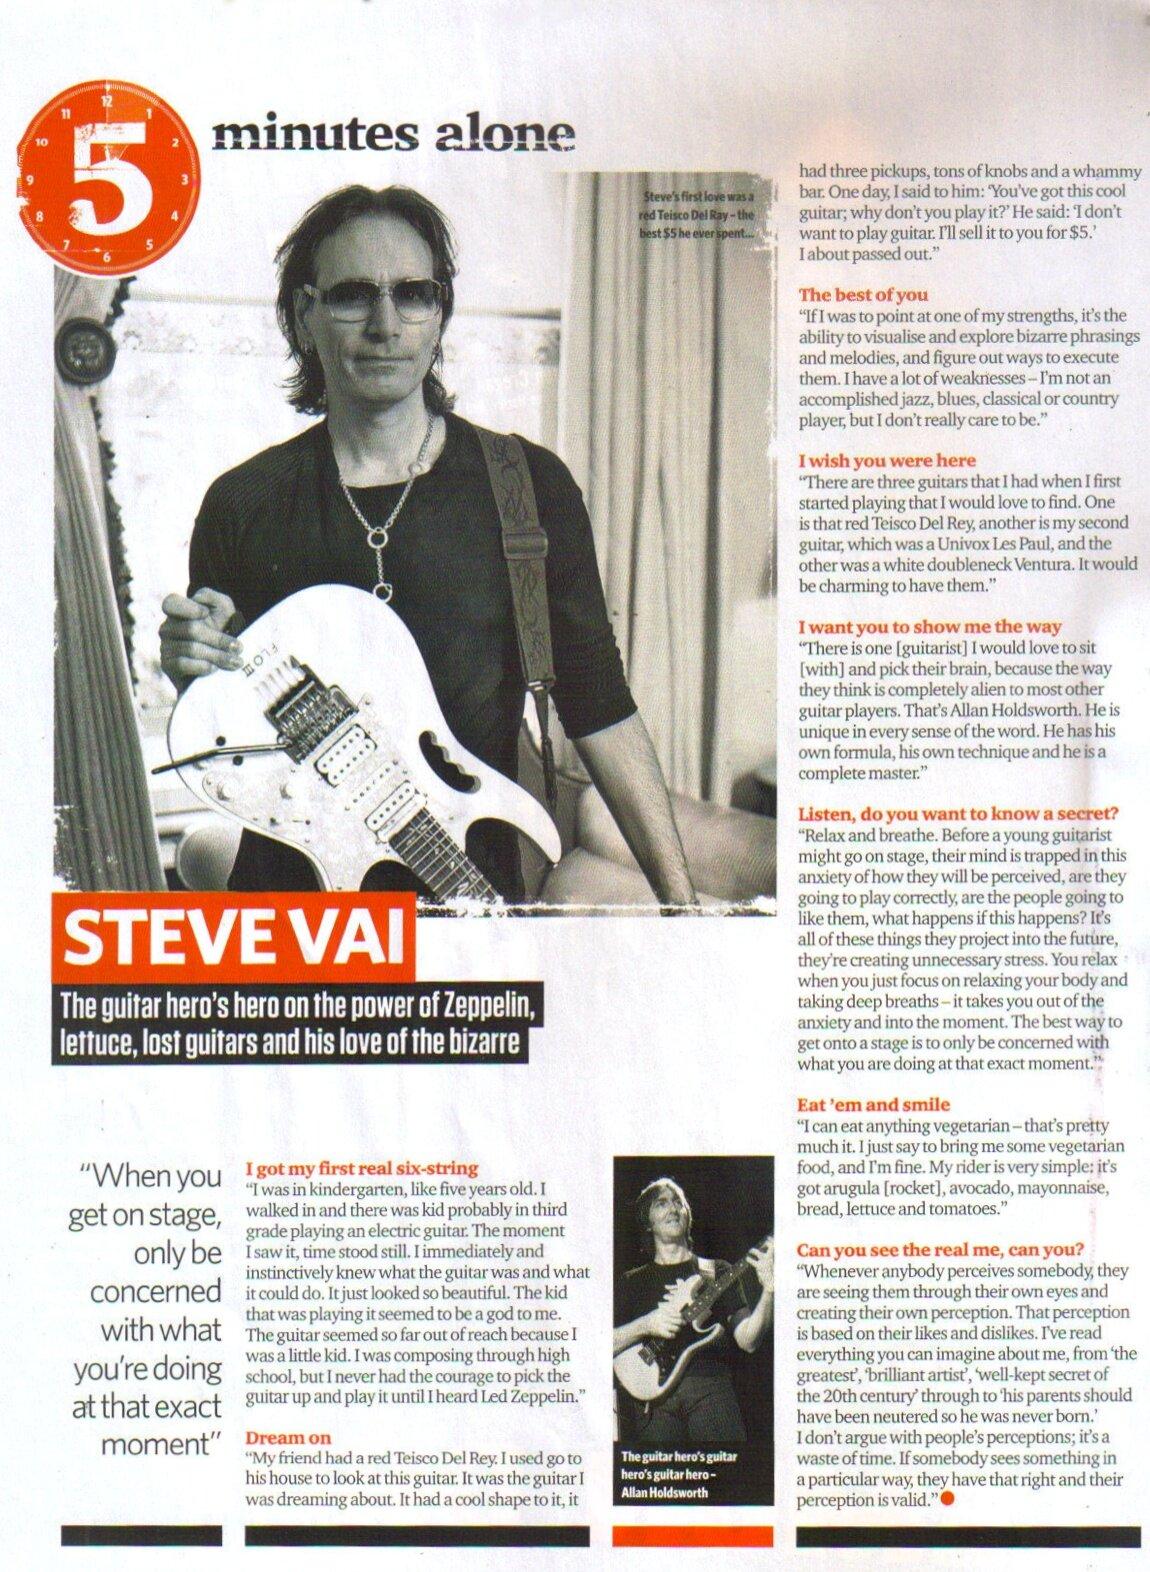 Steve talks Zeppelin, lettuce, lost guitars & his love of the bizarre in the March 2013 issue of Total Guitar UK Mag. http://t.co/V46UwlEG